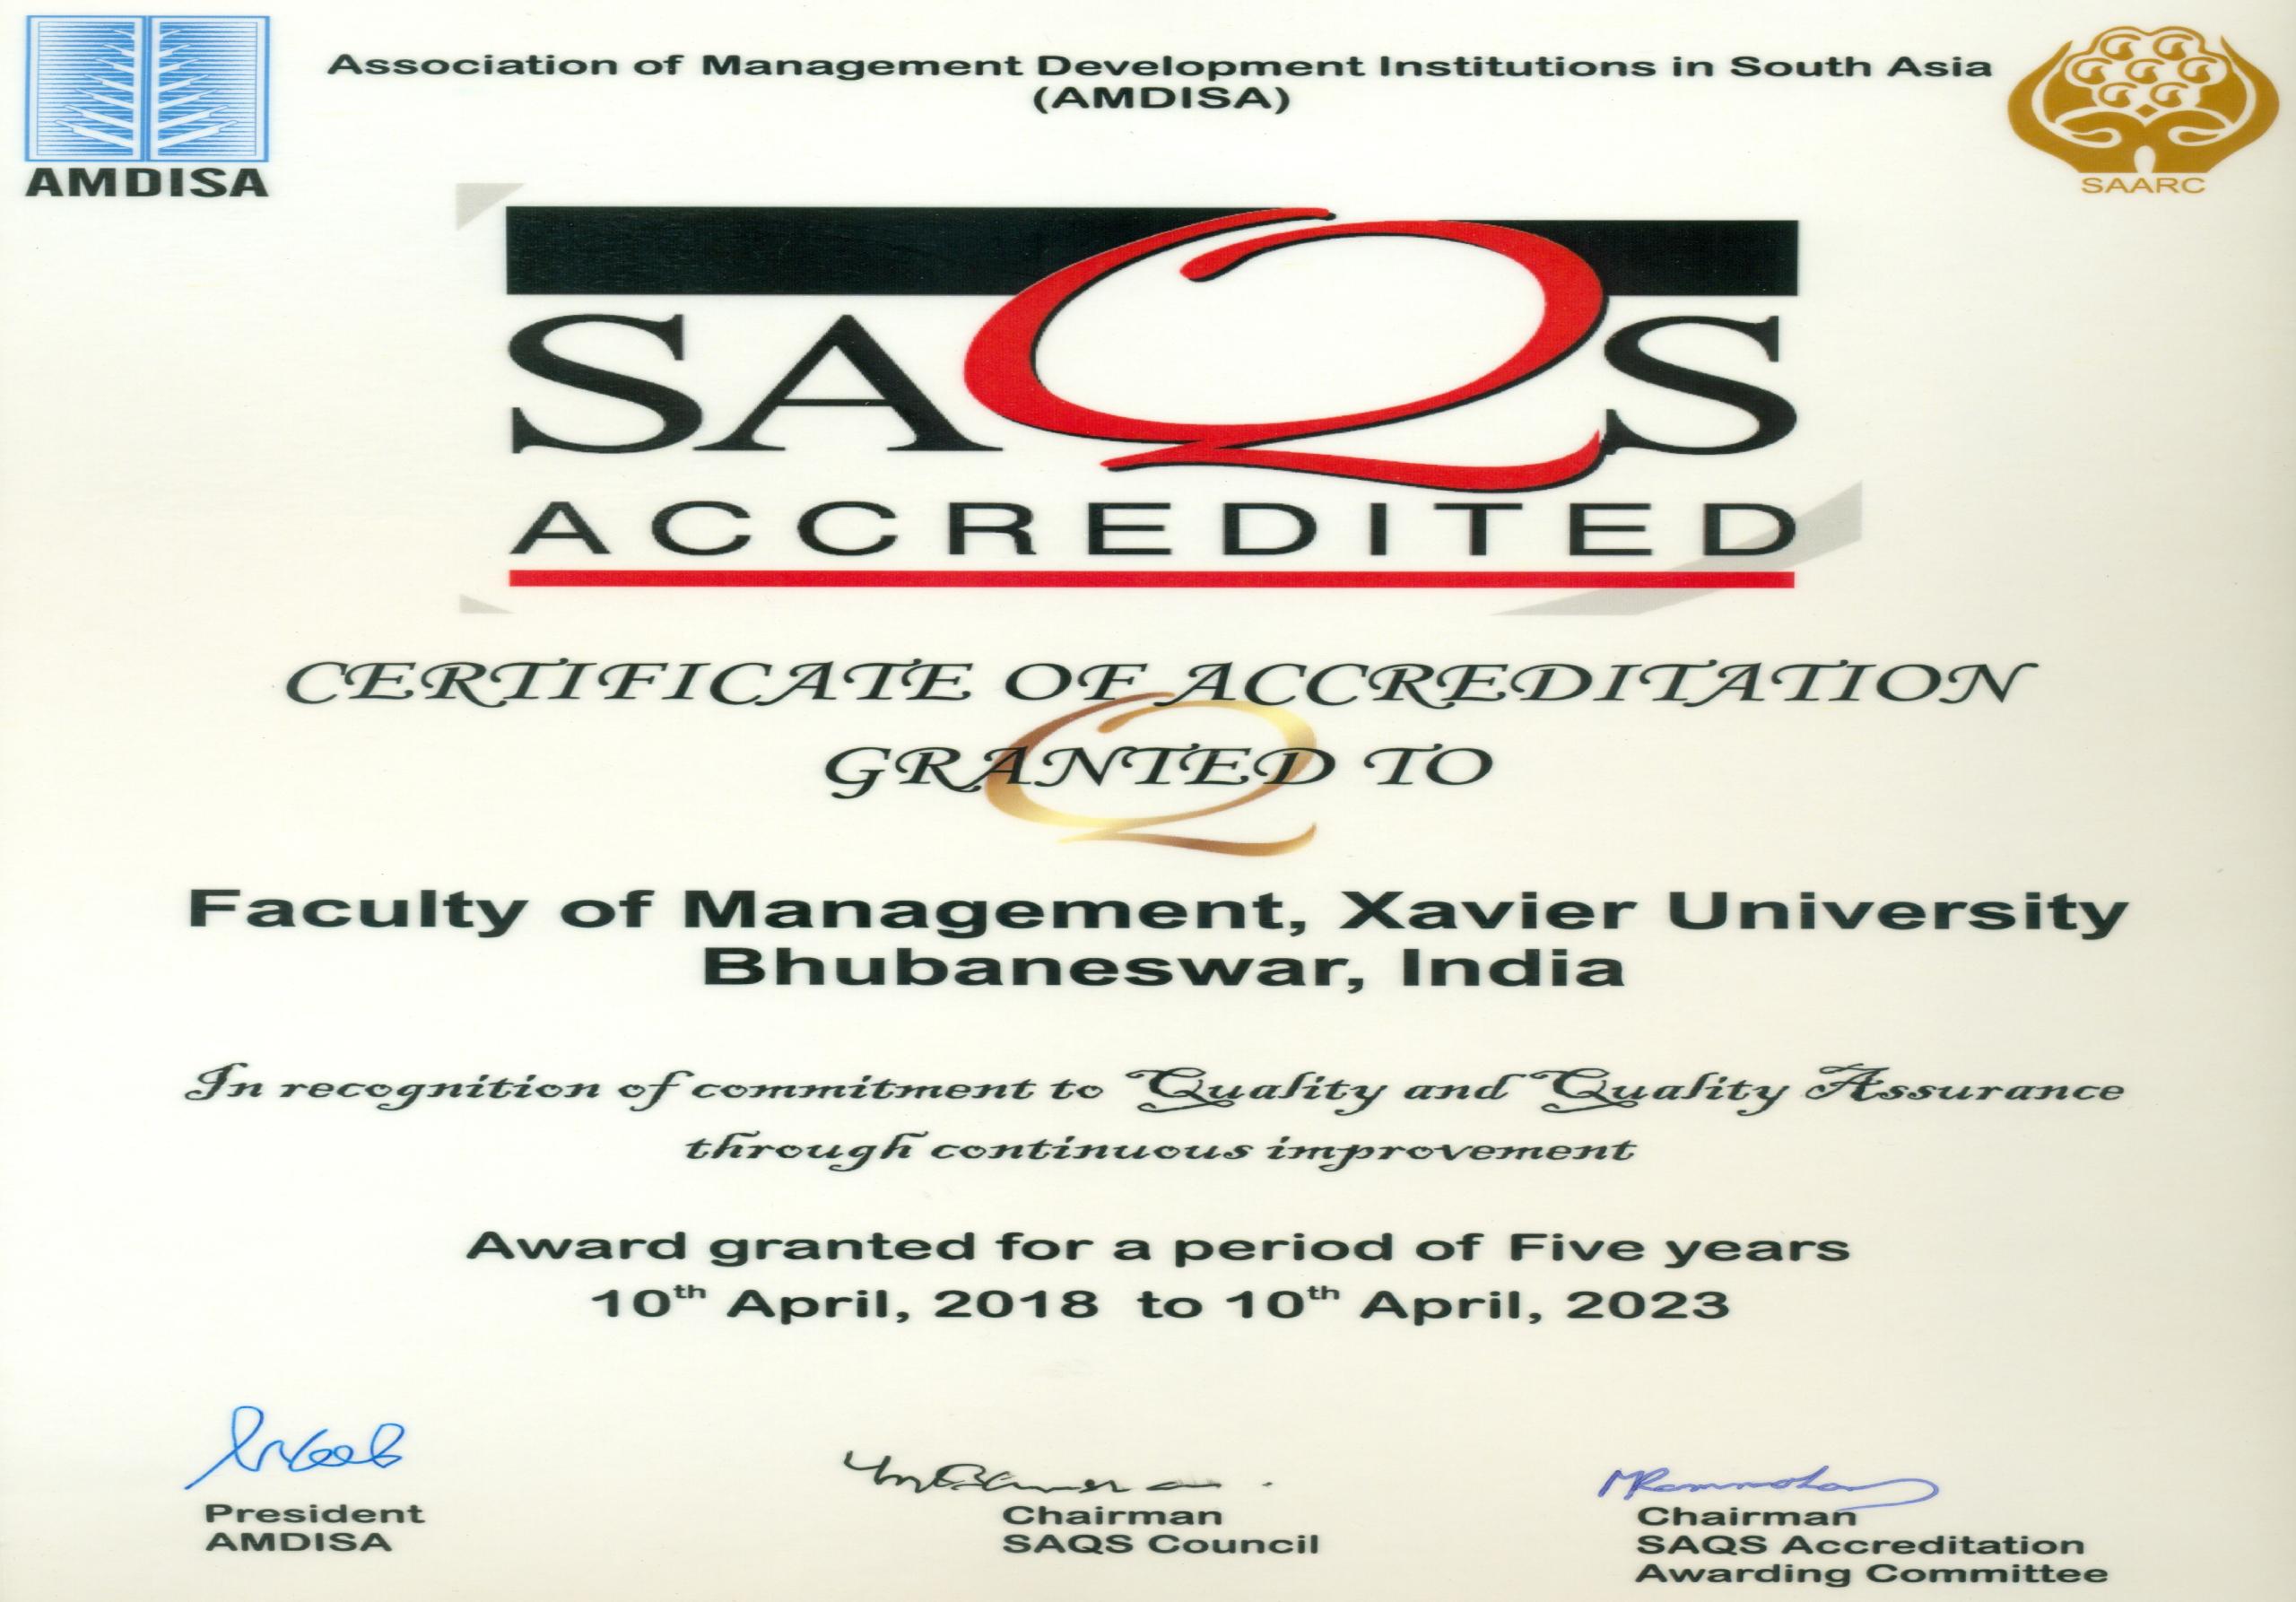 SAQS-Accrediation (1)